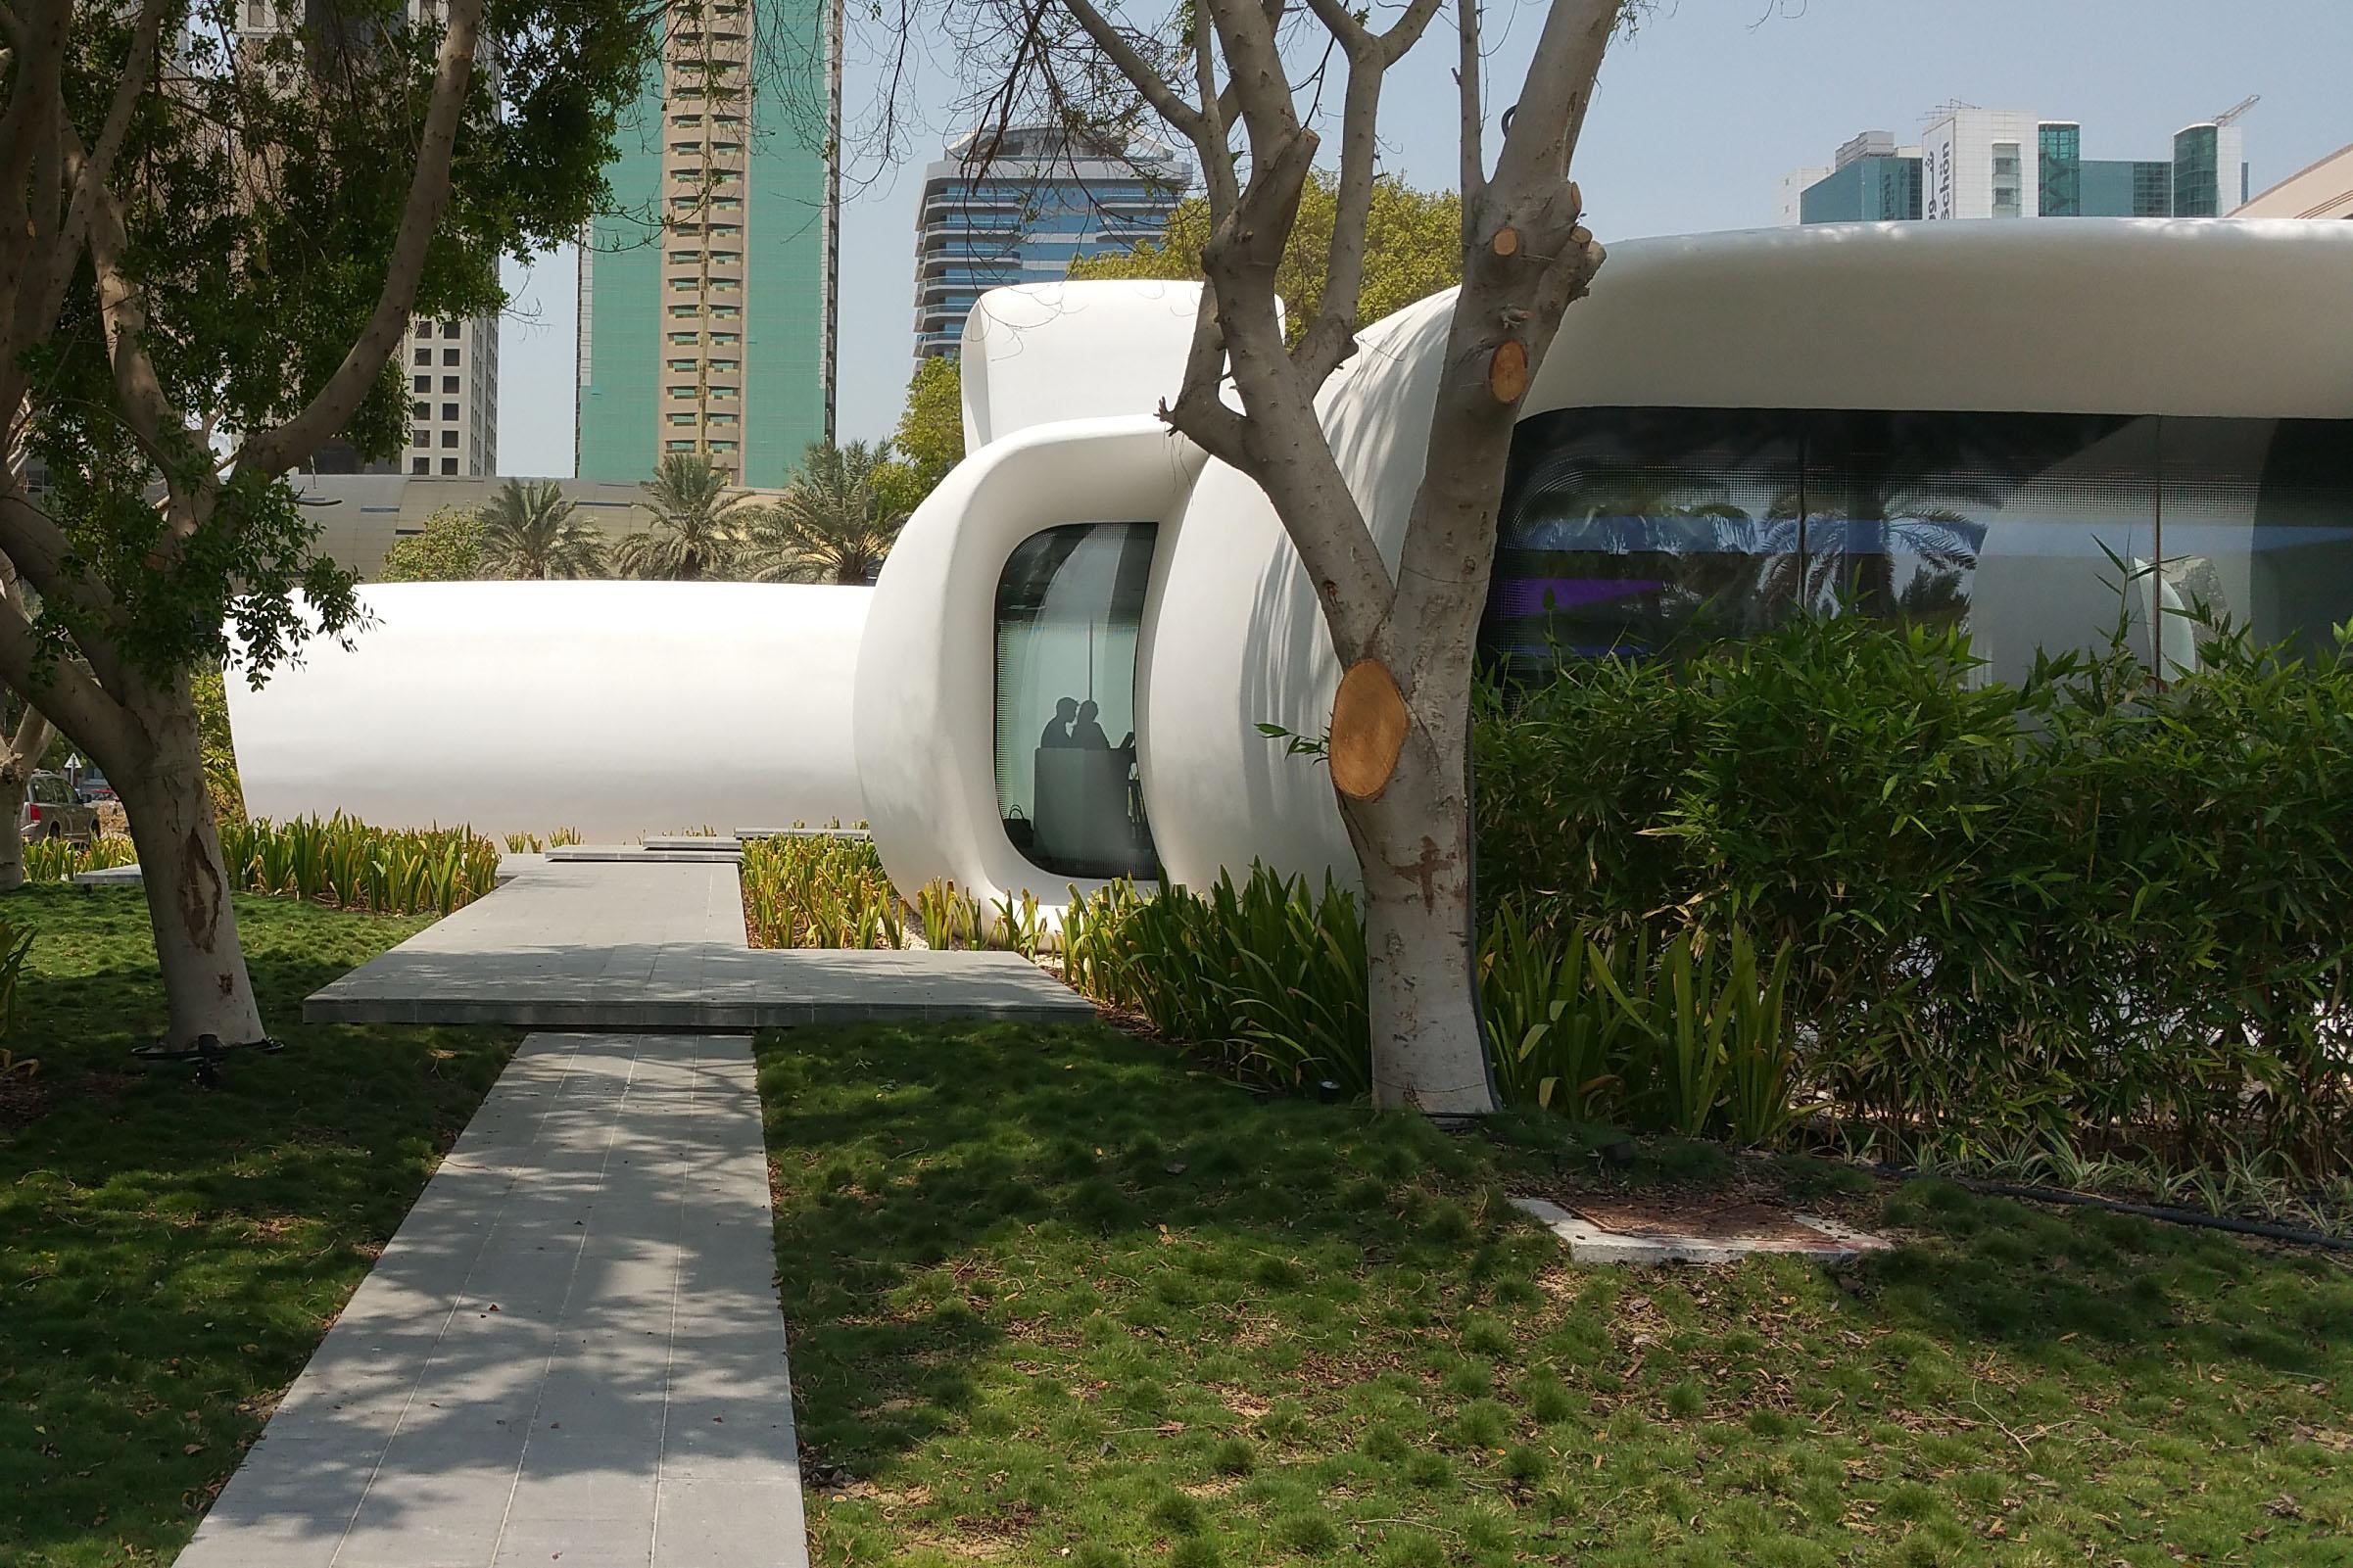 3d printed office Dubai | design Killa architects | 2016